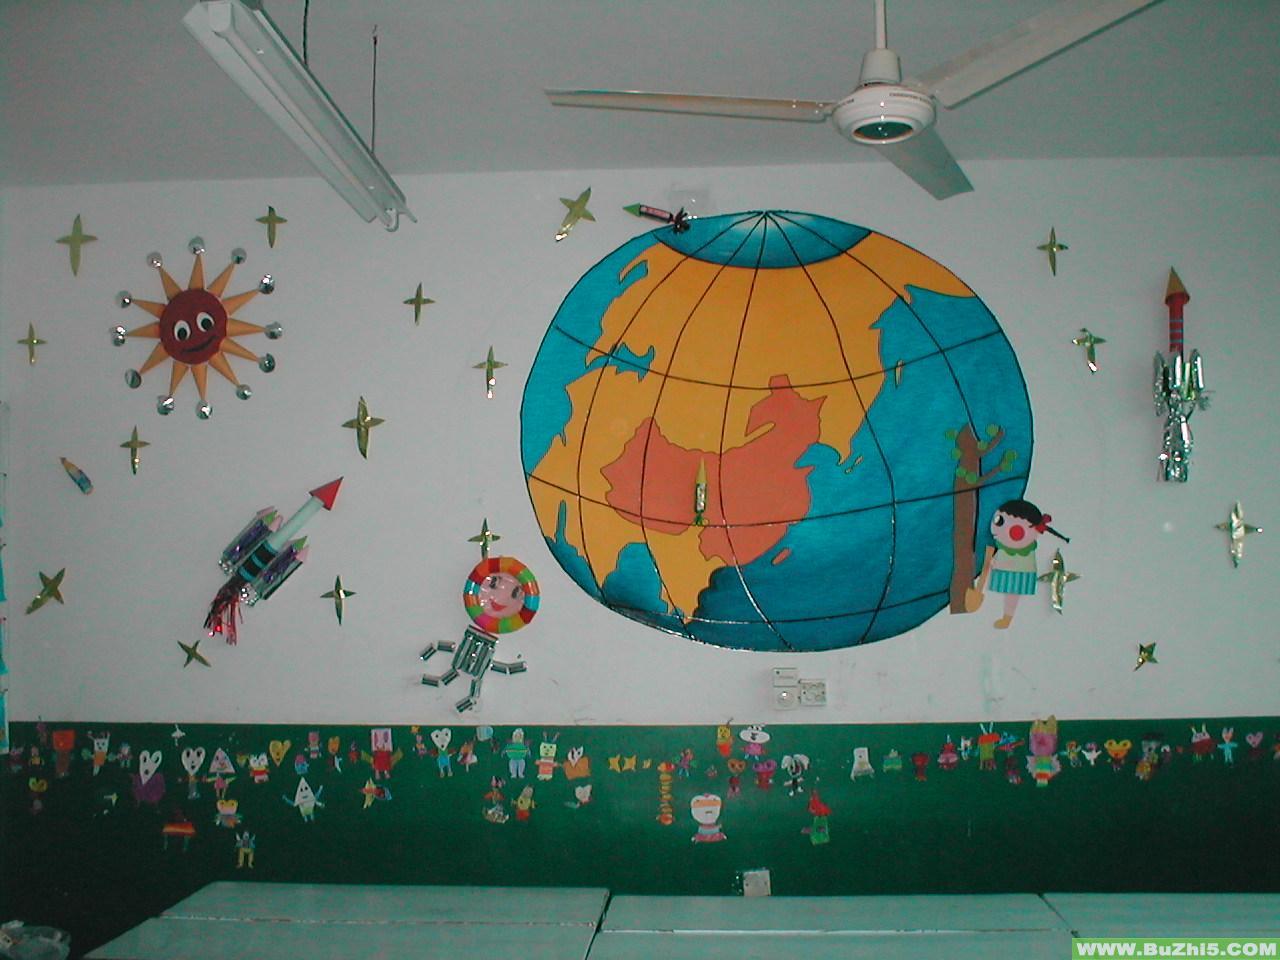 design 主题墙设计幼儿主题墙设计幼儿主题墙设计说明  城堡幼儿园